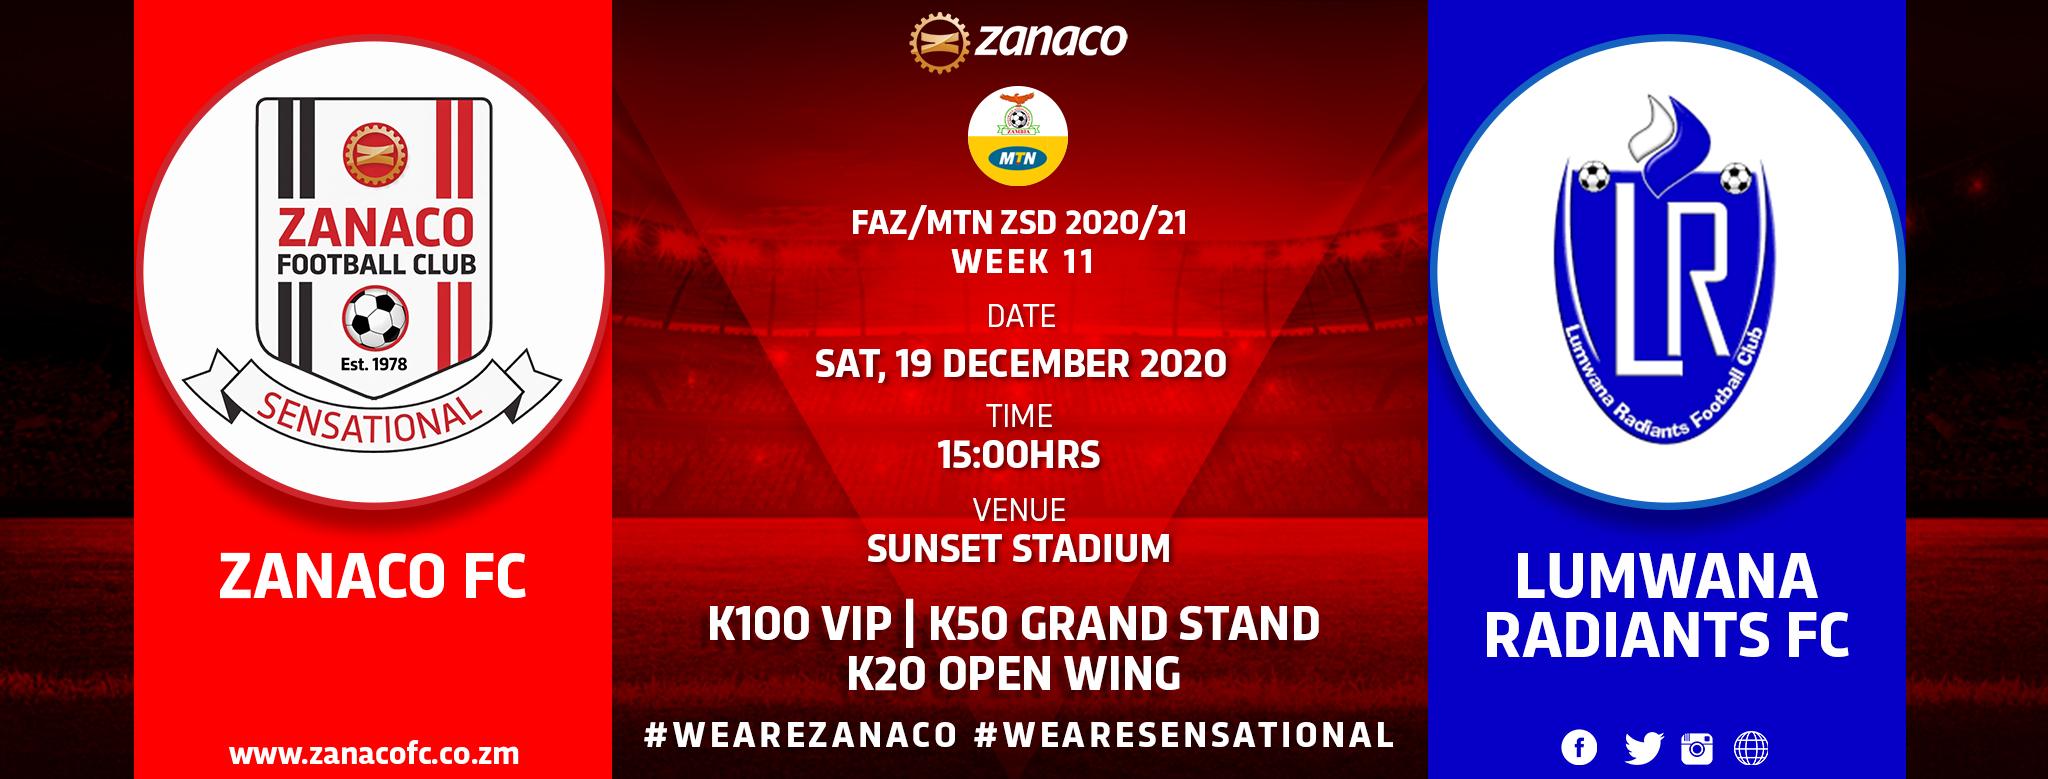 Match Promo 2021 WEEK 11.jpg